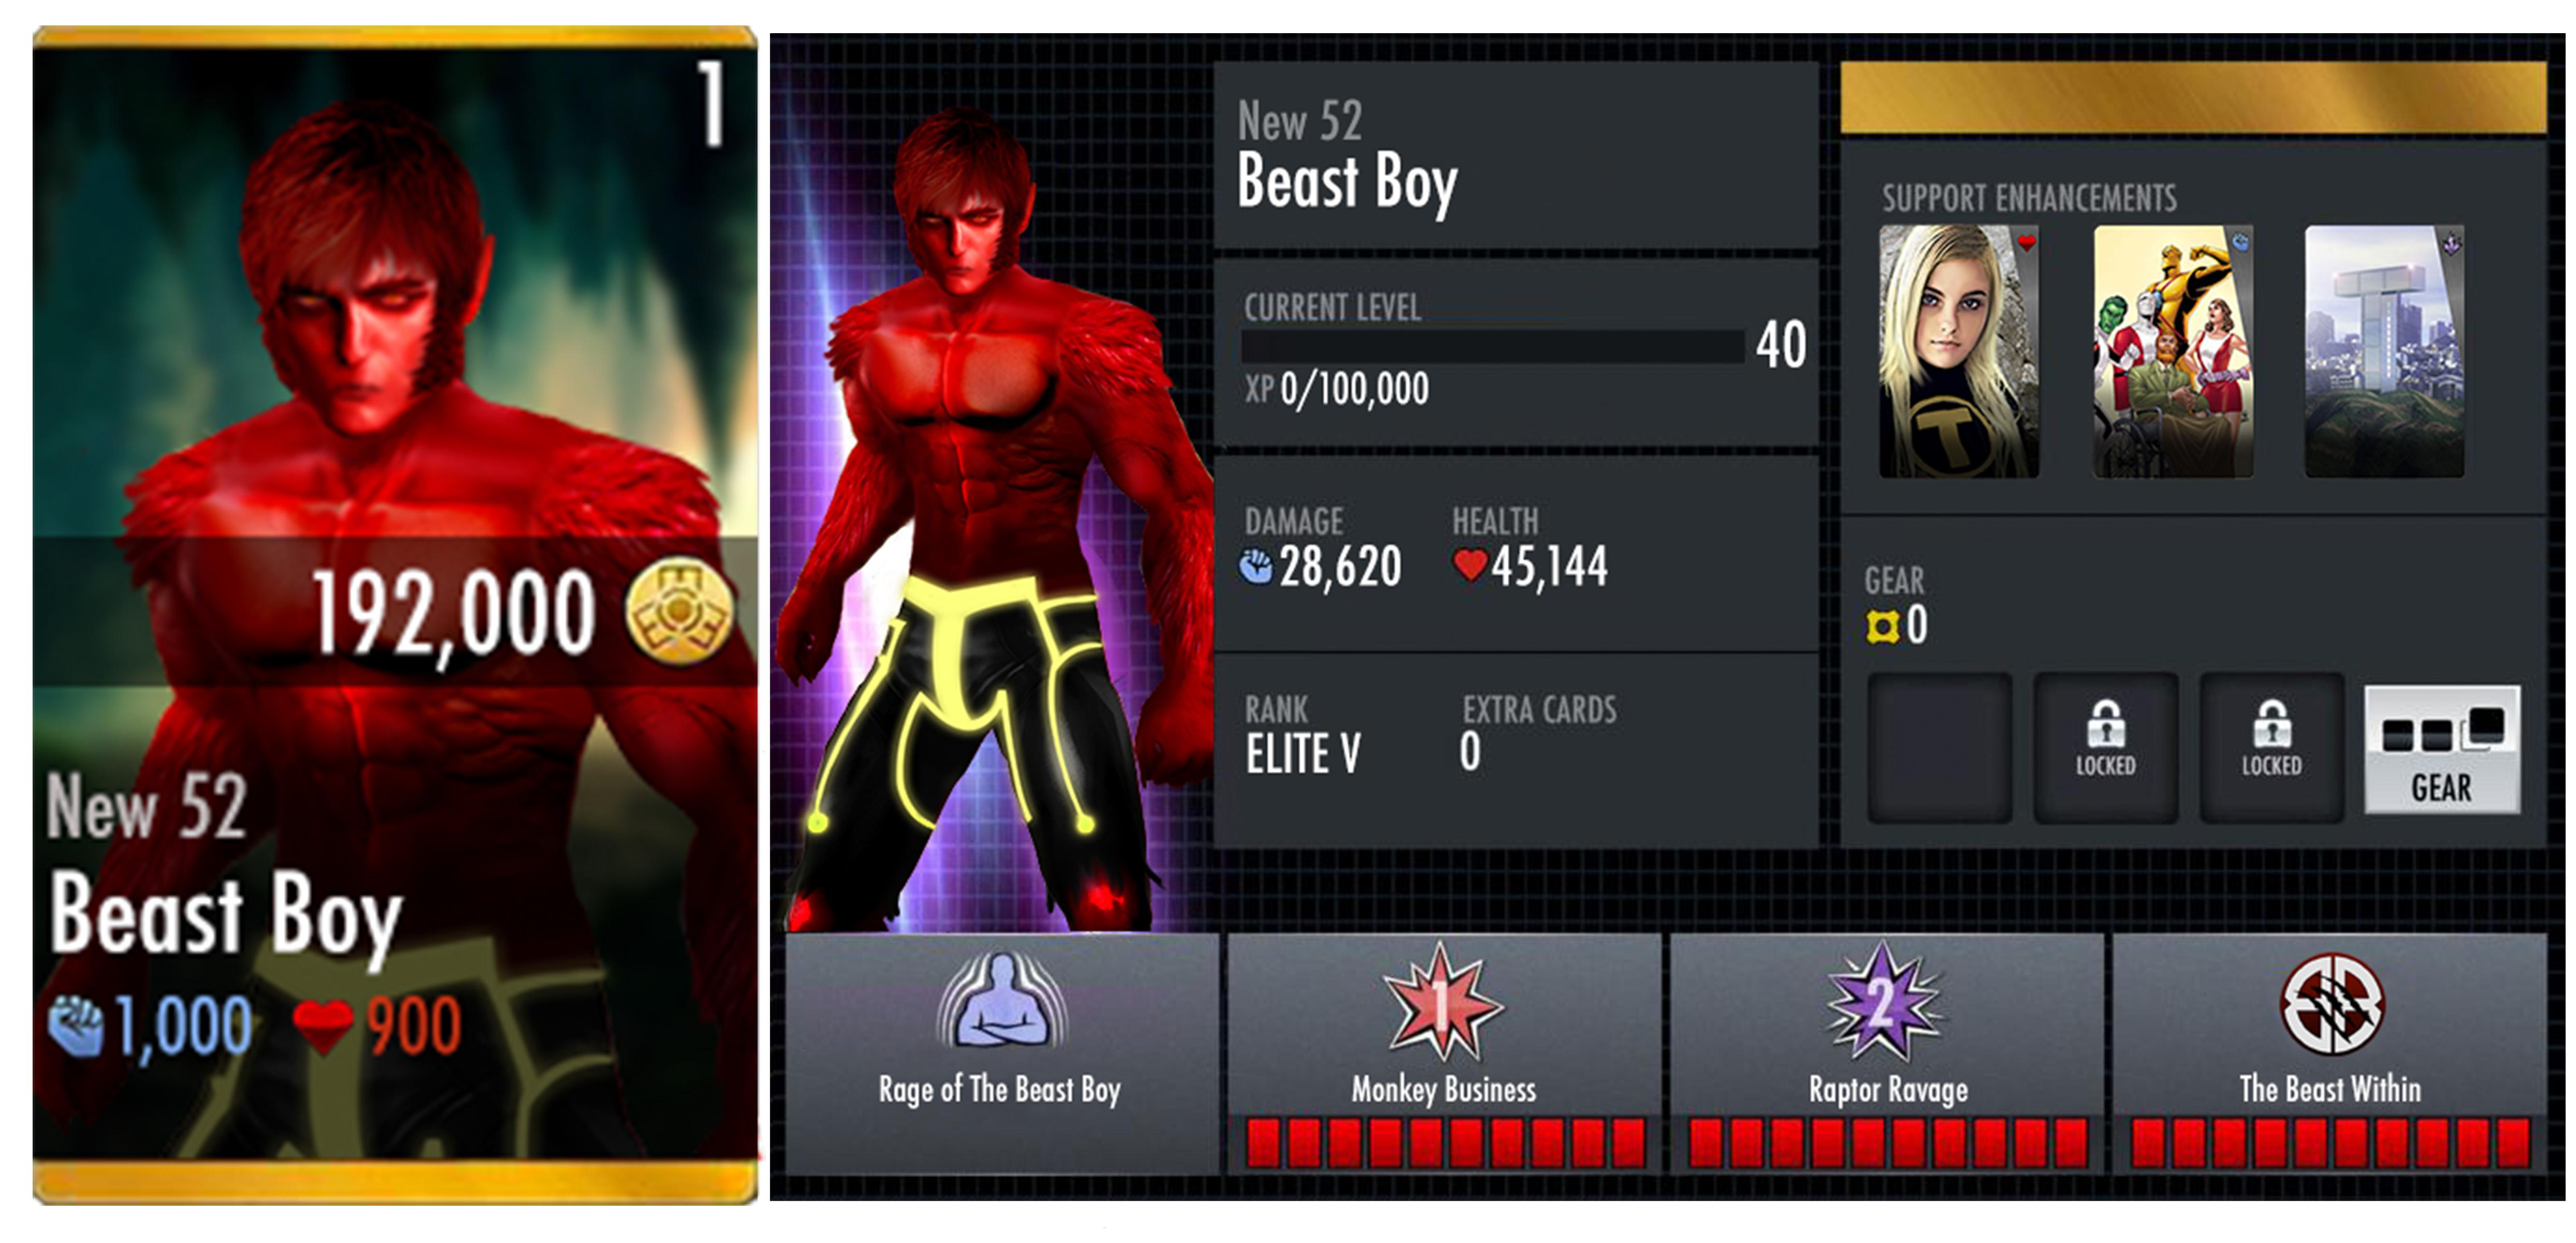 Beast Boy New 52 Injustice Card by edrayed on DeviantArt